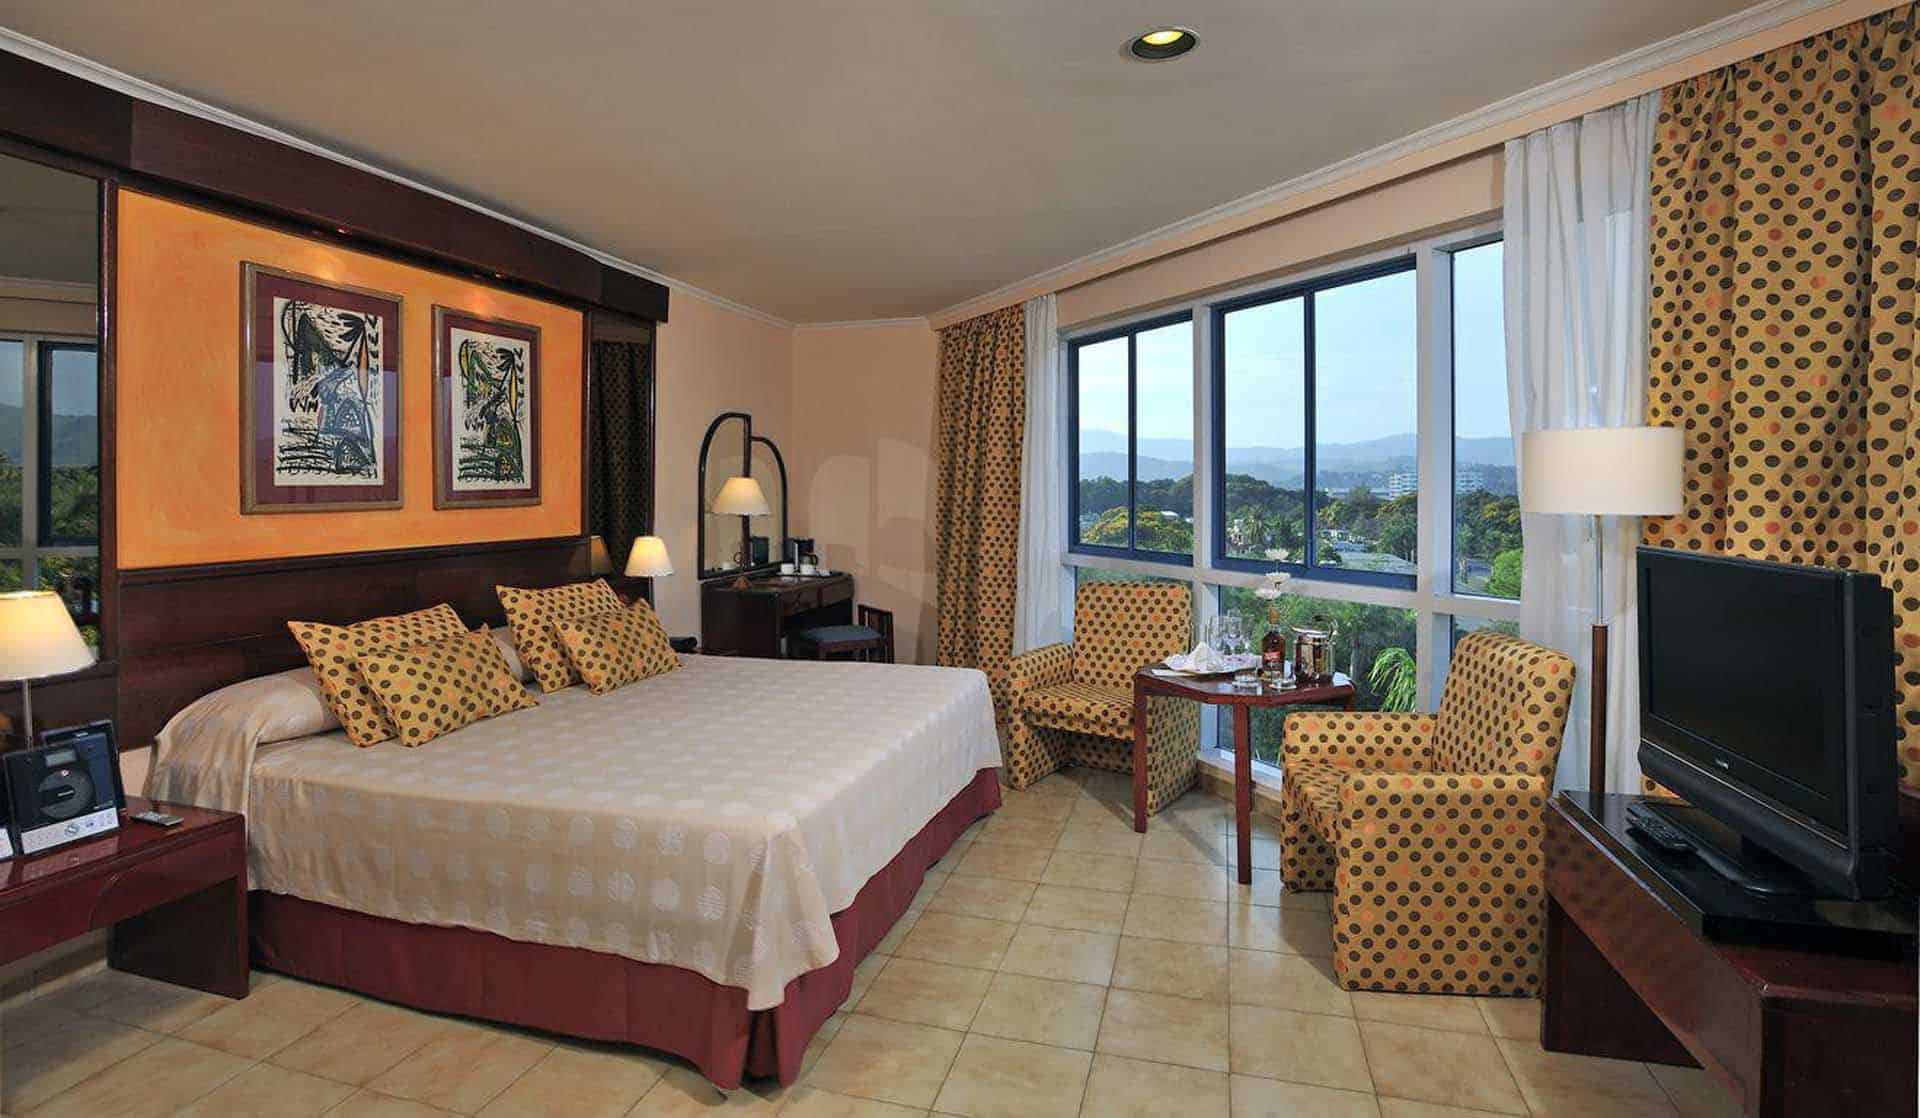 H1630 Junior Suite hotel Melia Santiago de Cuba